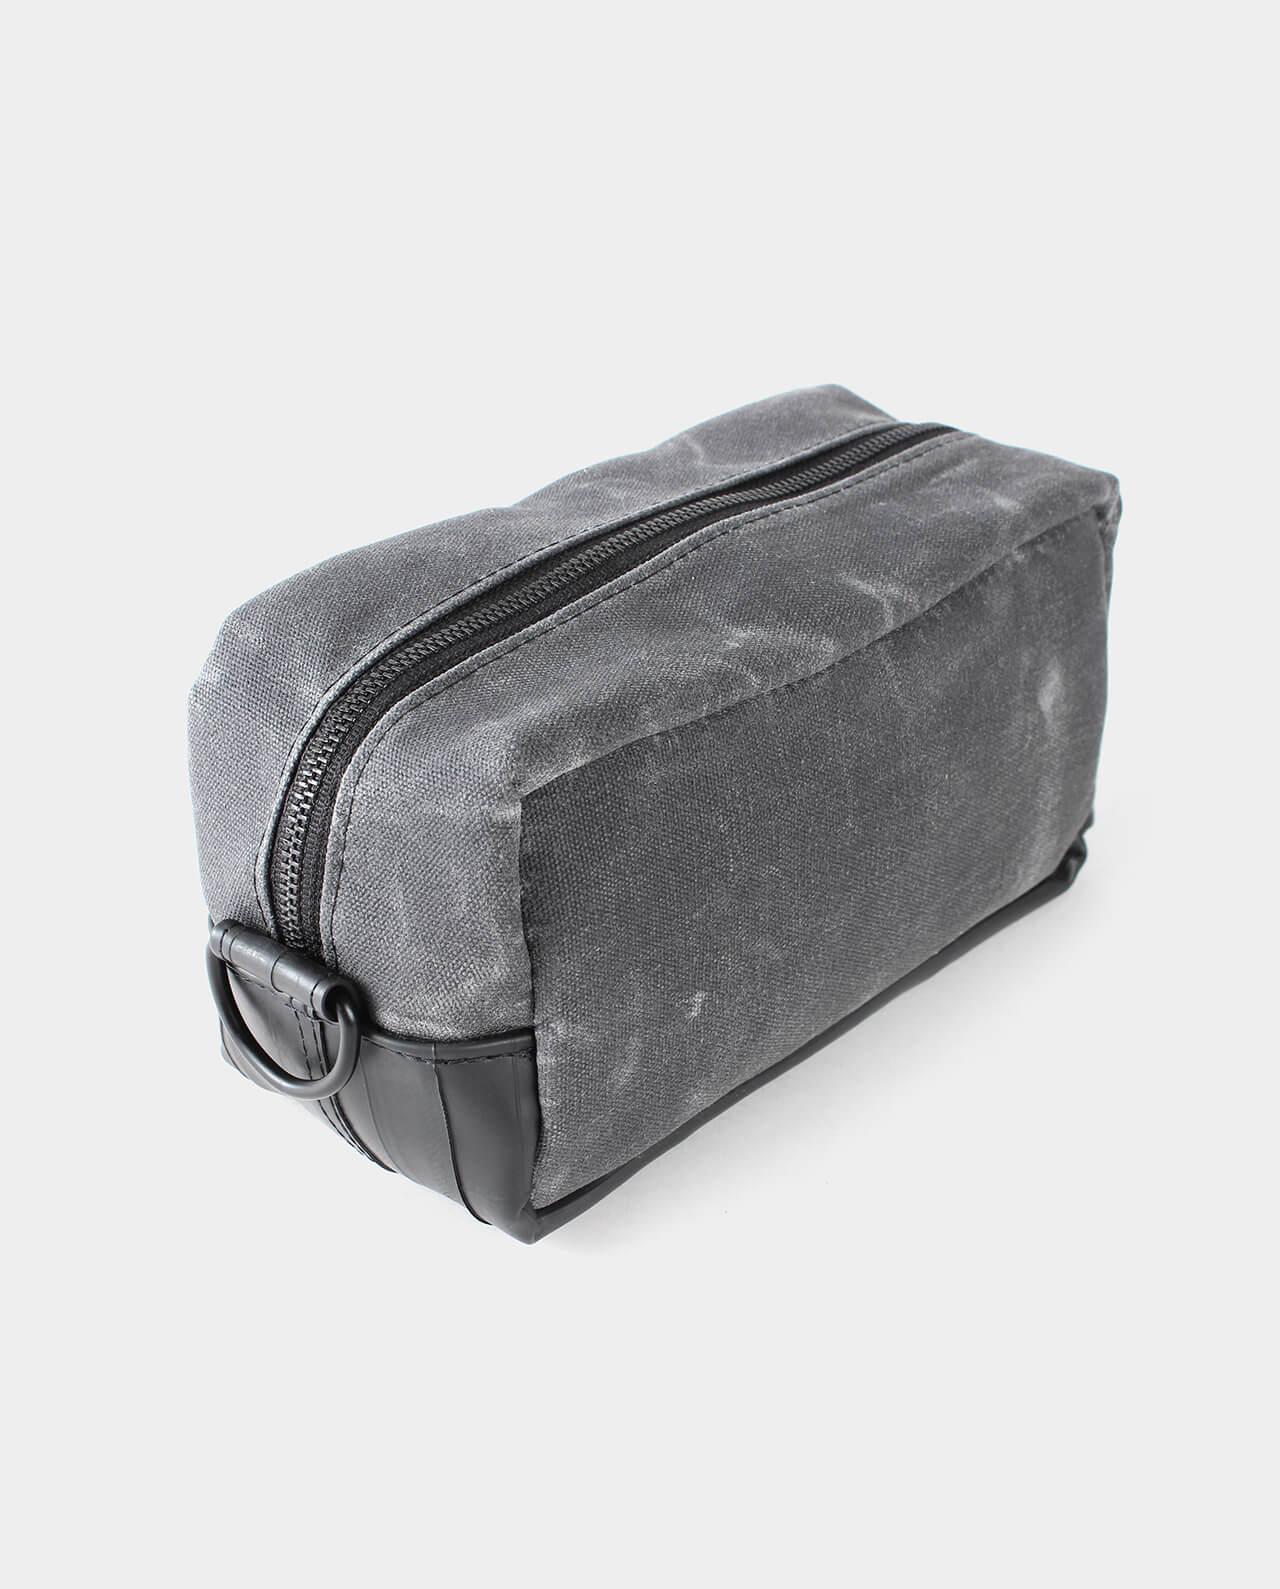 Luggage clipart travel kit. Marco dopp